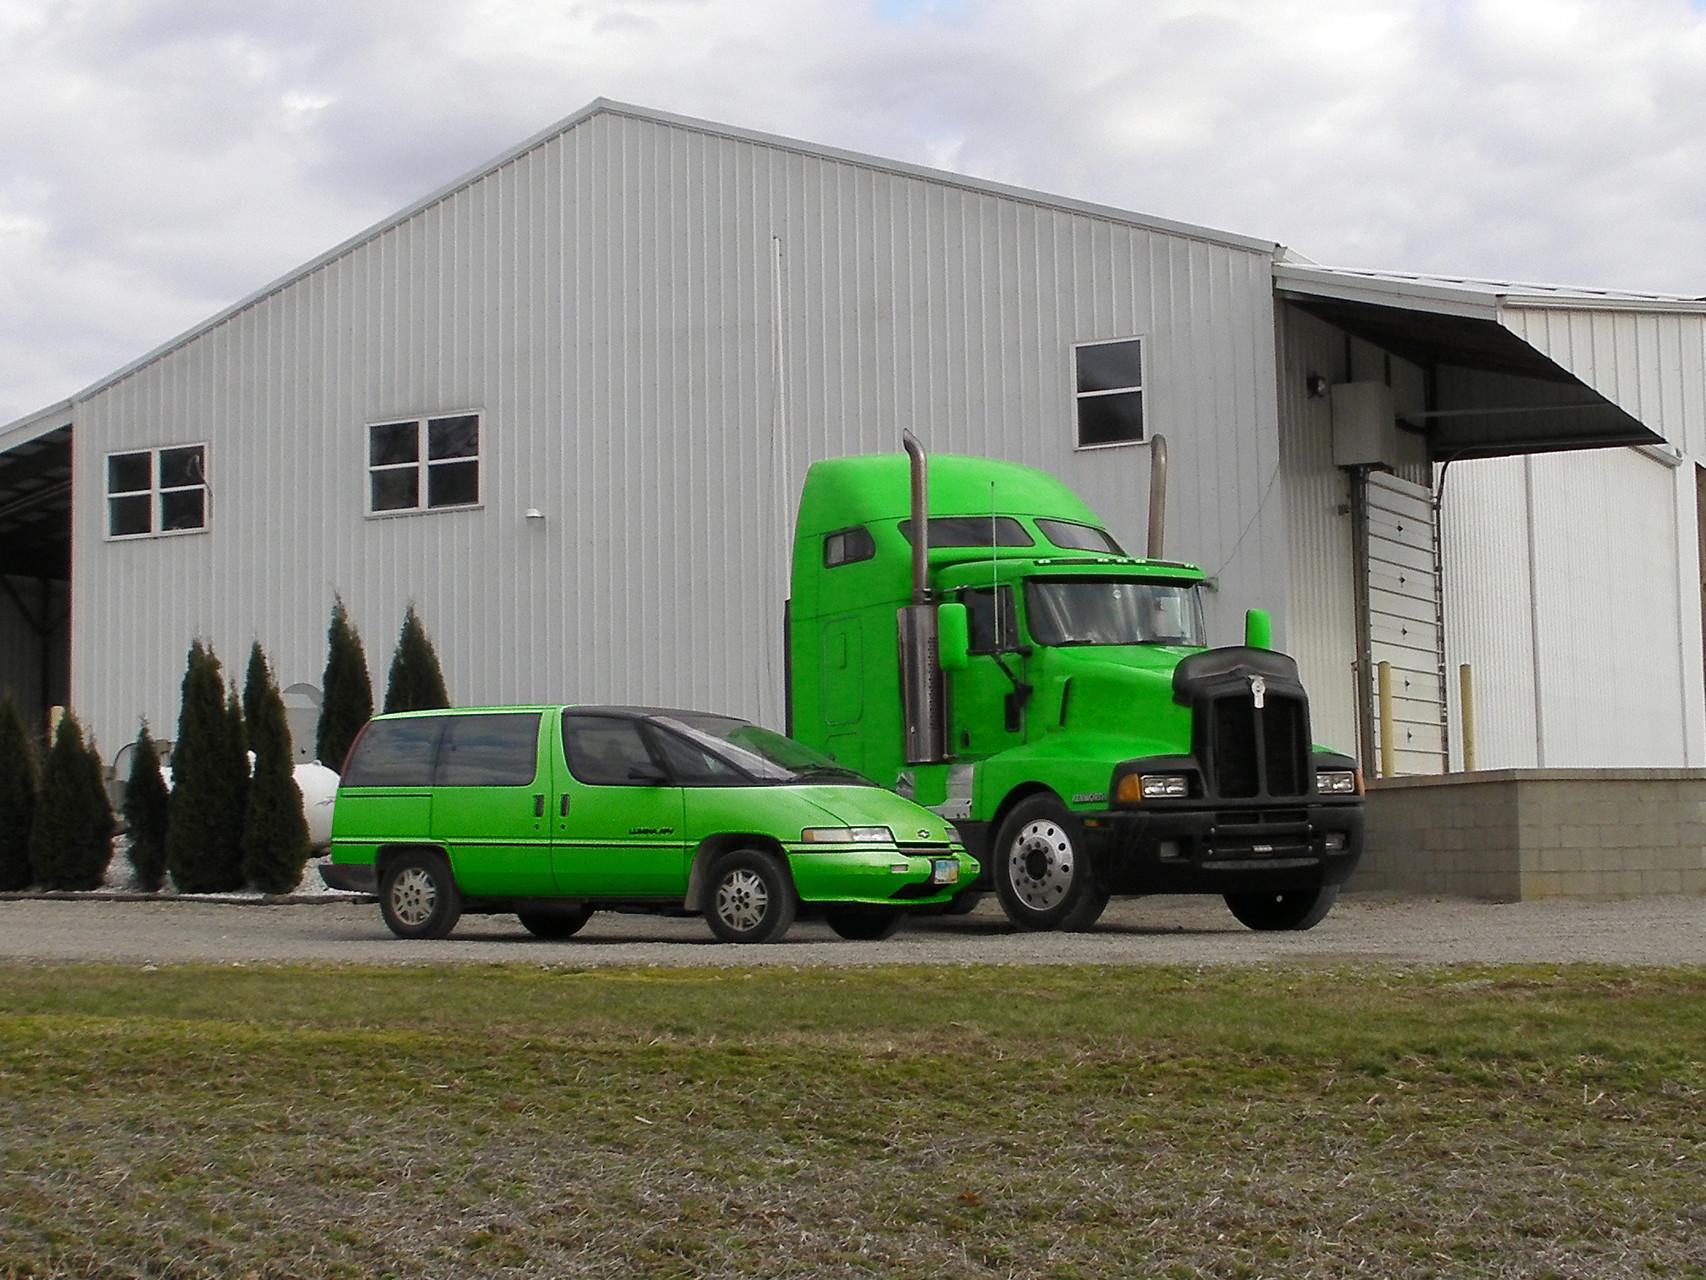 Niama-Reisser, llc First Semi Truck and Car test beds